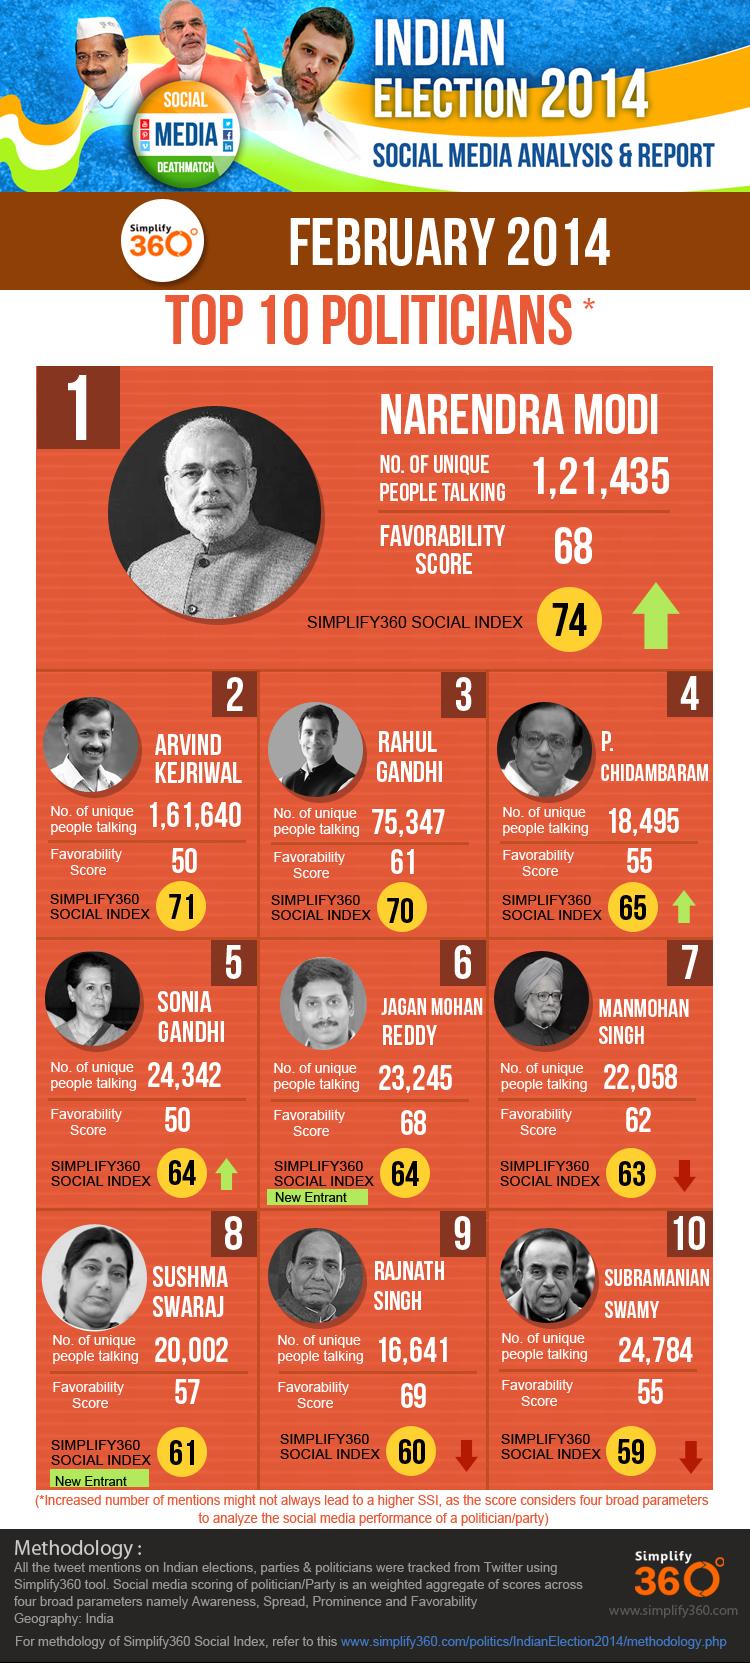 TOP 10 POLITICIANS February 2014